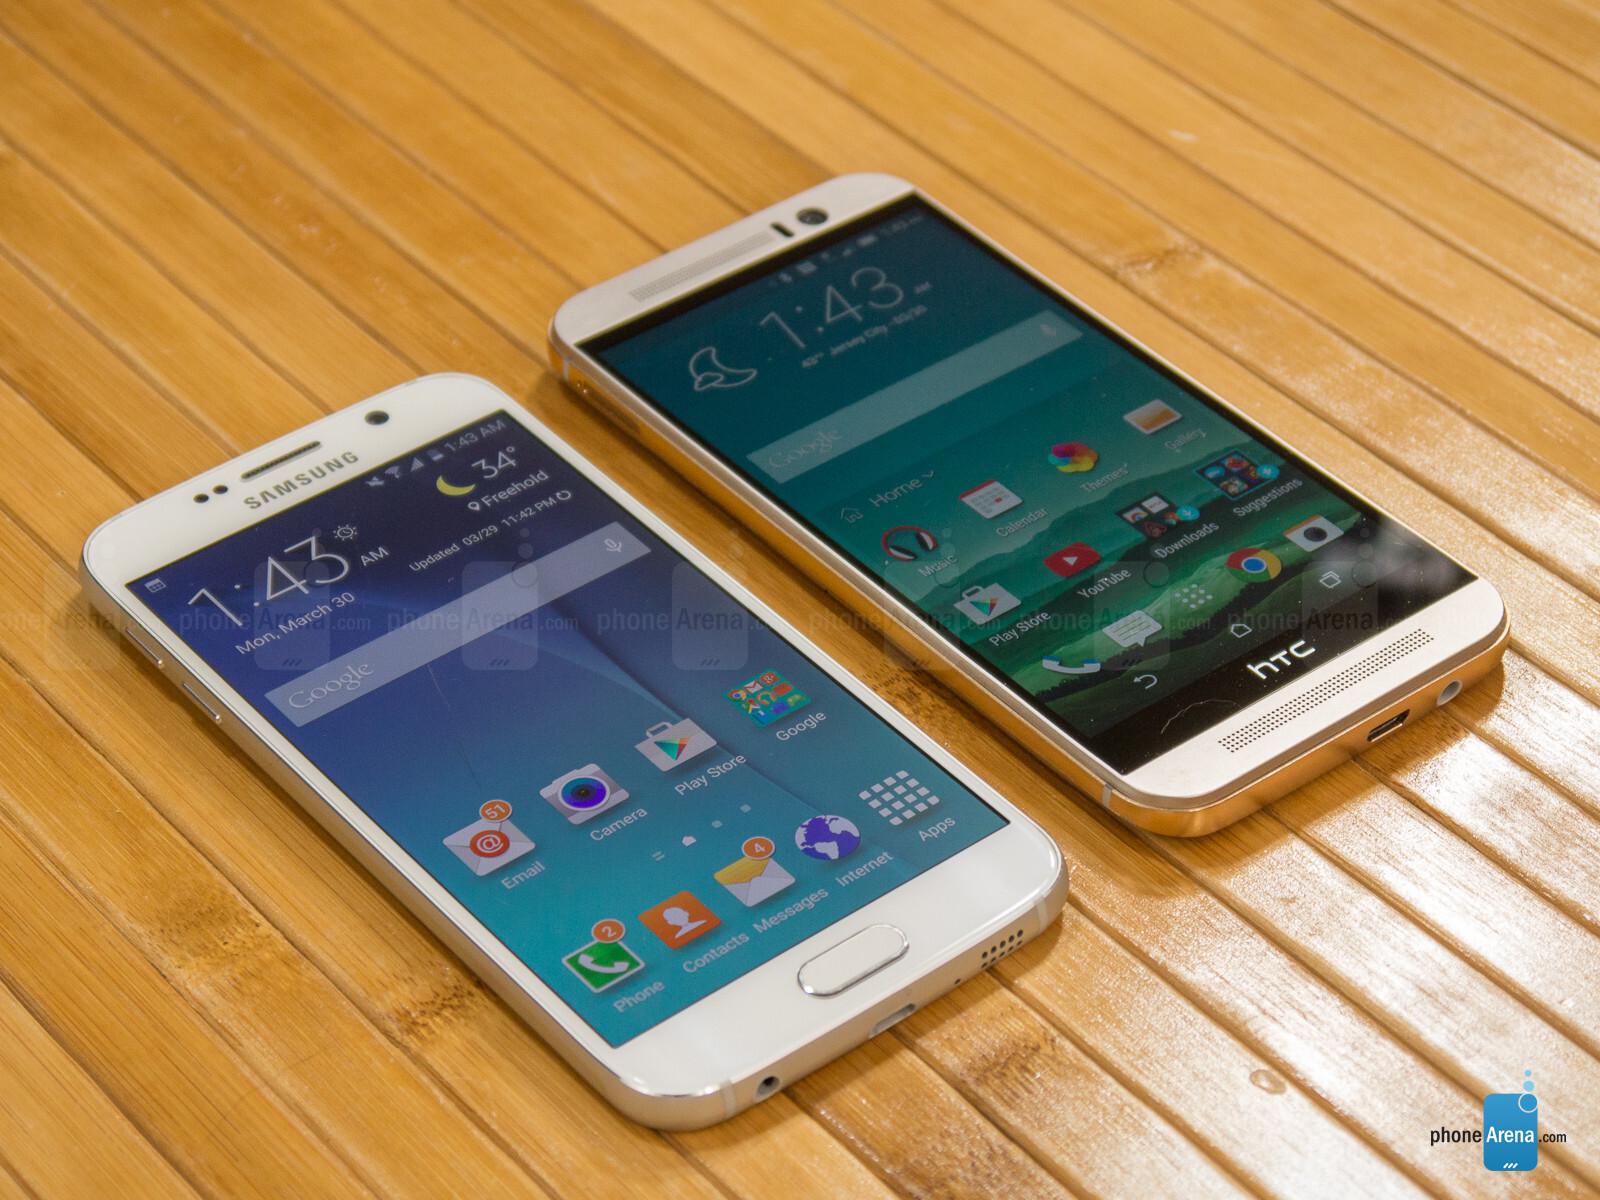 Samsung galaxy note 5 vs htc one m9 plus a comparison - Samsung Galaxy Note 5 Vs Htc One M9 Plus A Comparison 18